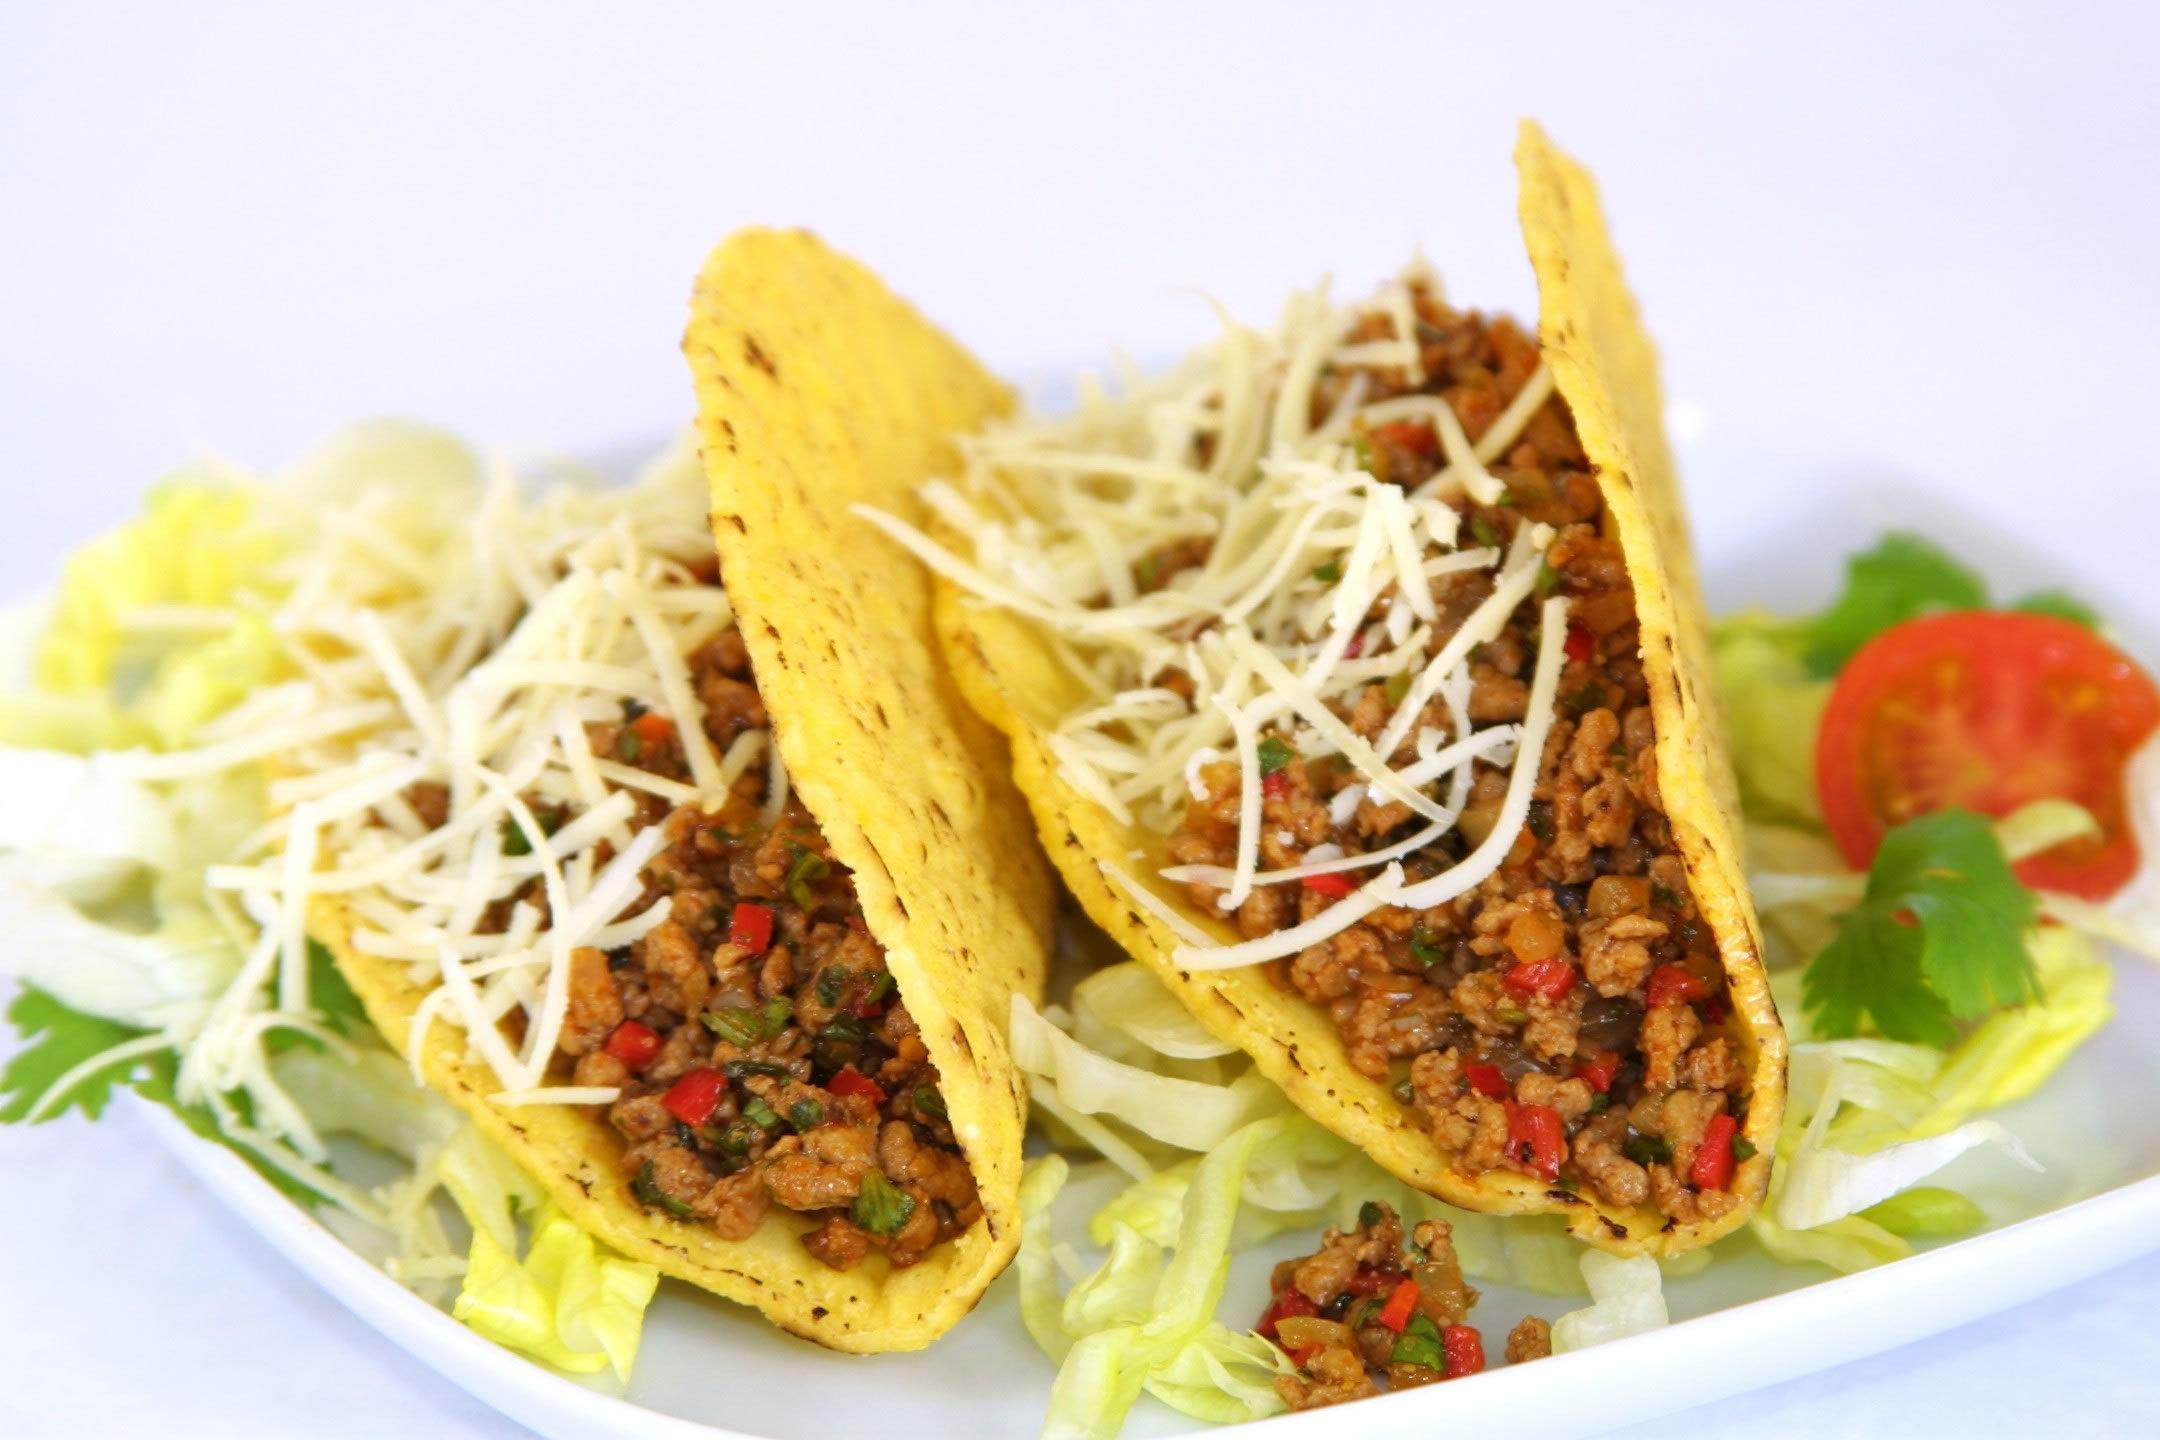 мексиканское бурито рецепт с фото